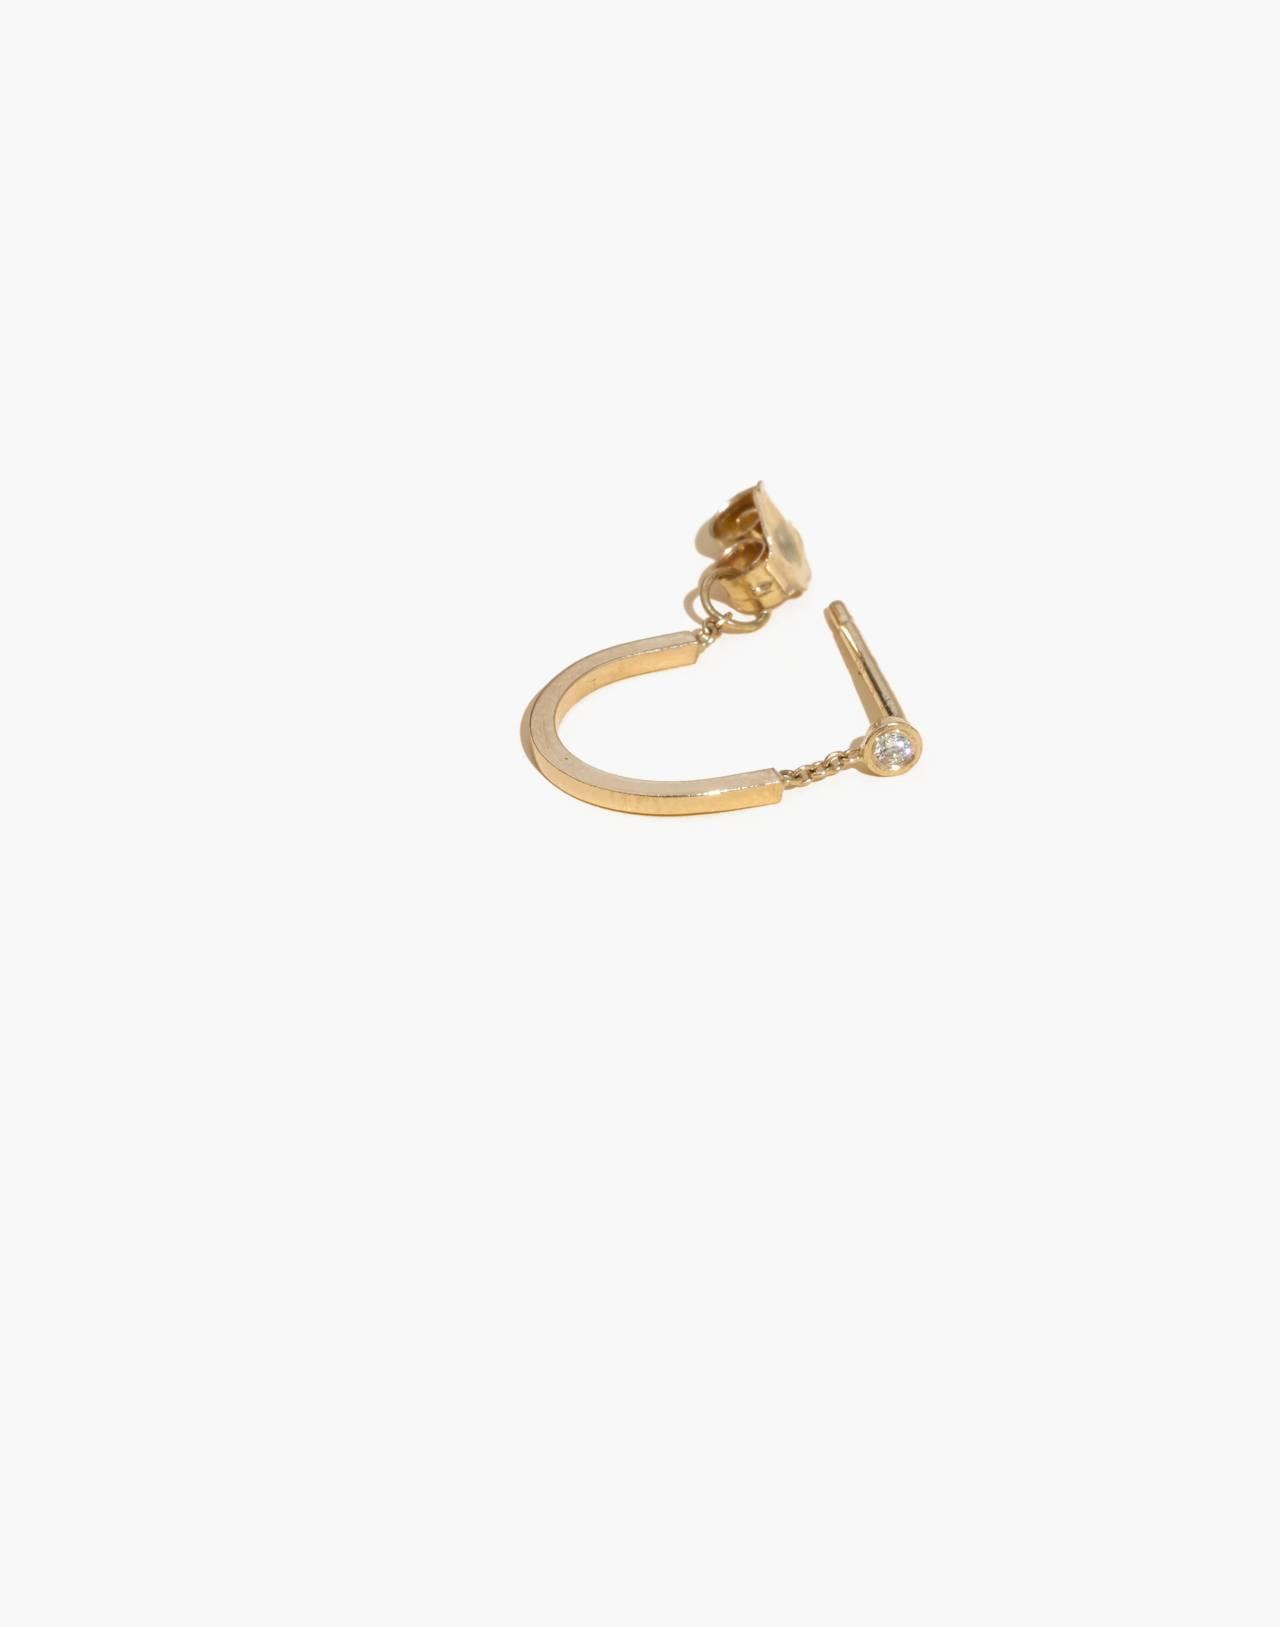 Madewell x Still House™ Single 14k Gold Rytas Diamond Earring in gold image 1